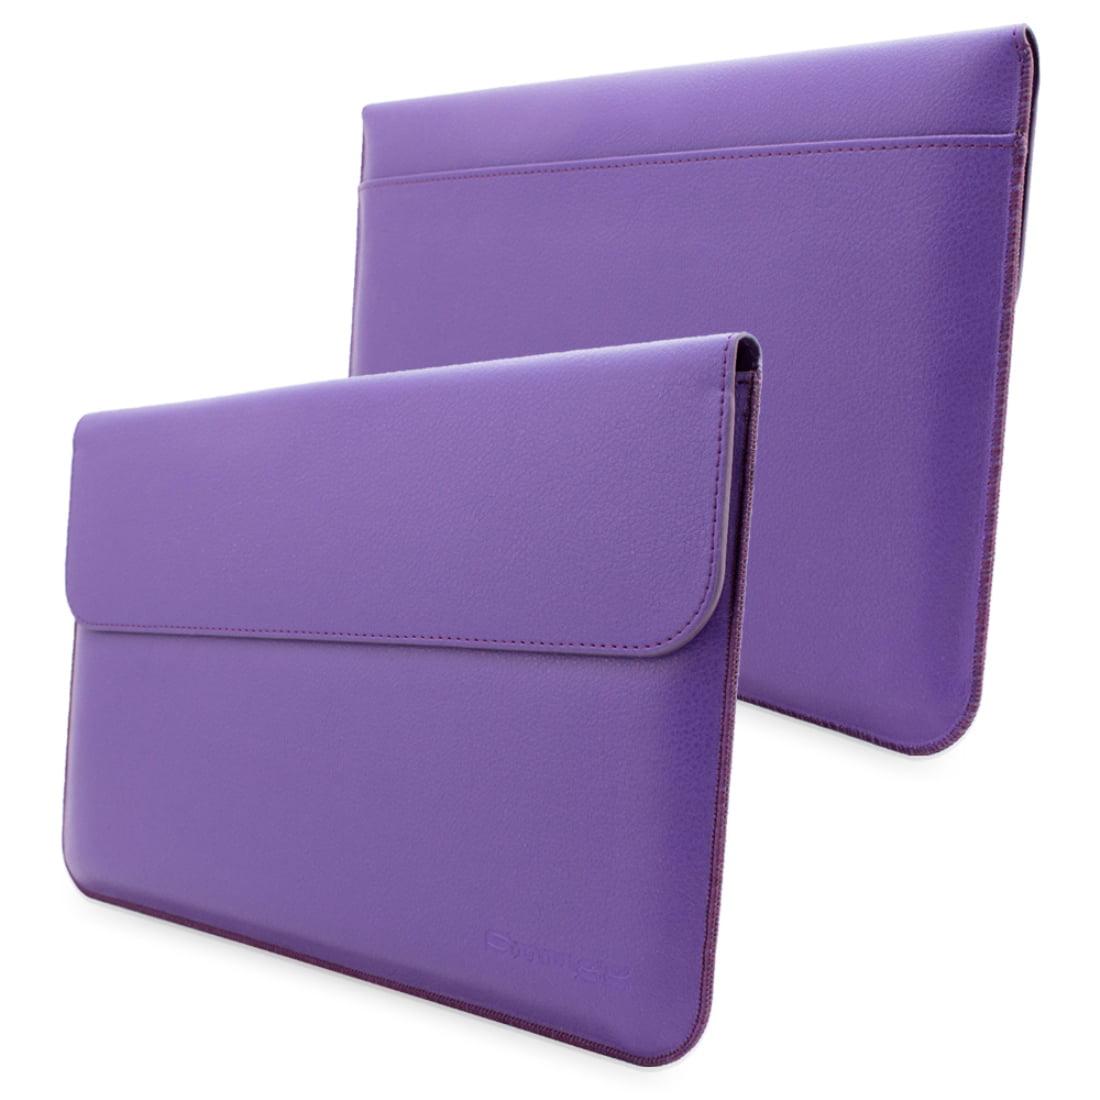 Snugg Purple Leather Microsoft Surface 2 Sleeve Case